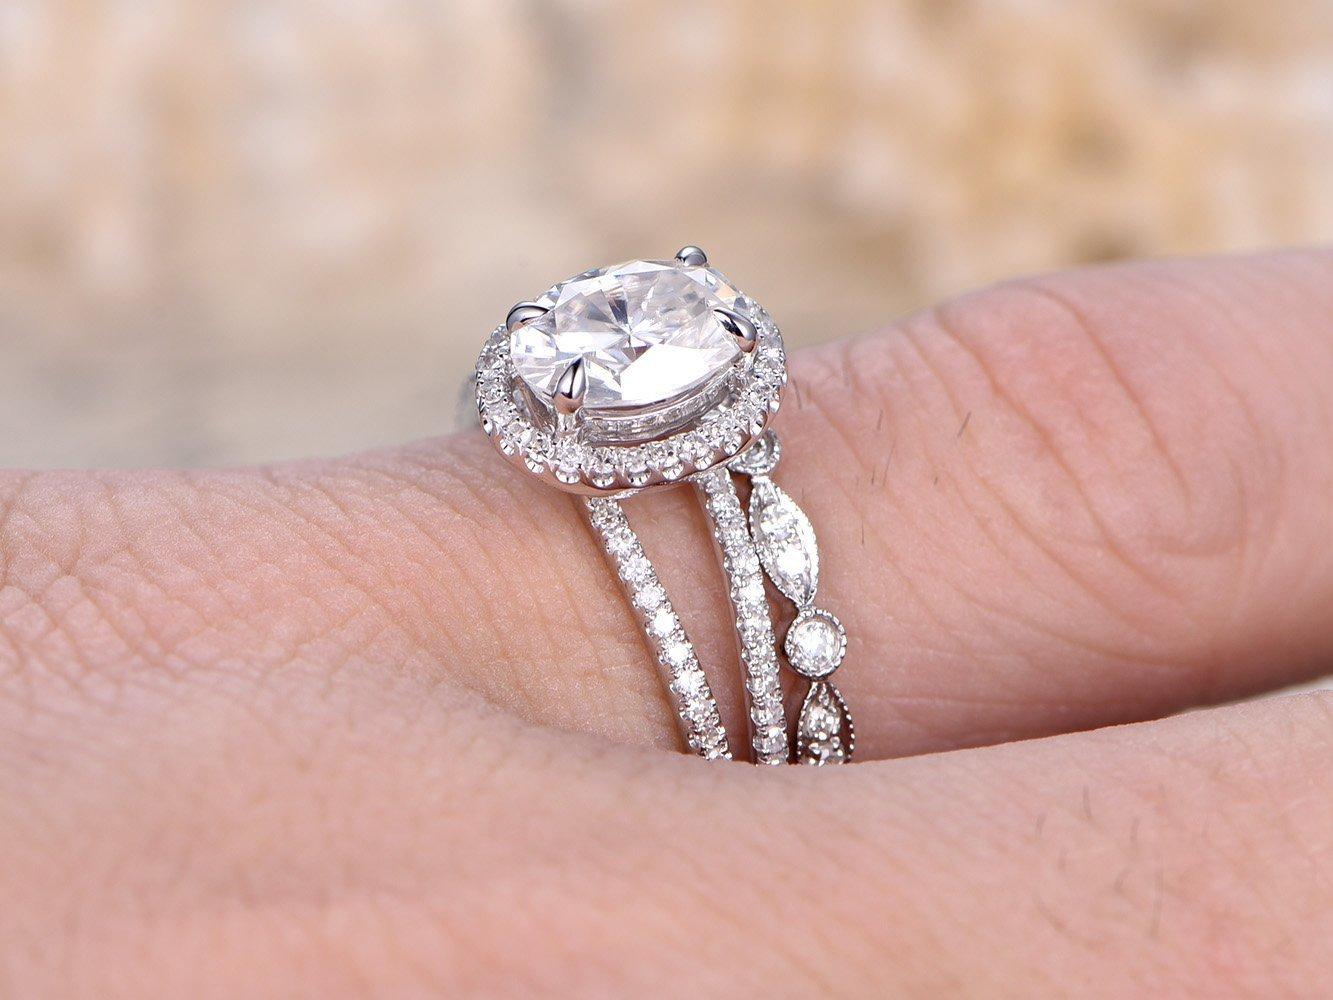 Amazon.com: 2pcs Diamond Ring Set, 6x8mm Oval Cut 1.5ct Charles ...